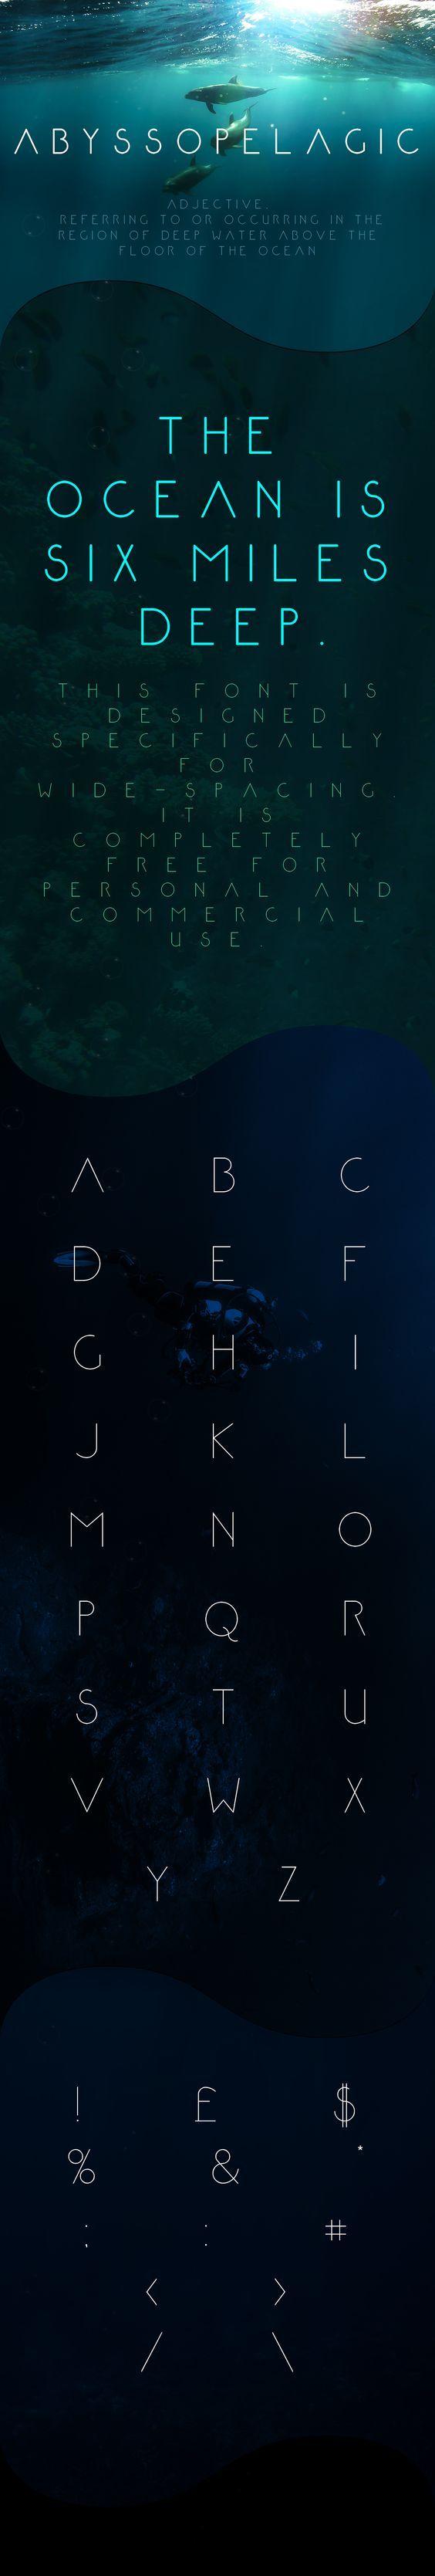 Abyssopelagic - free Personal par Mark White